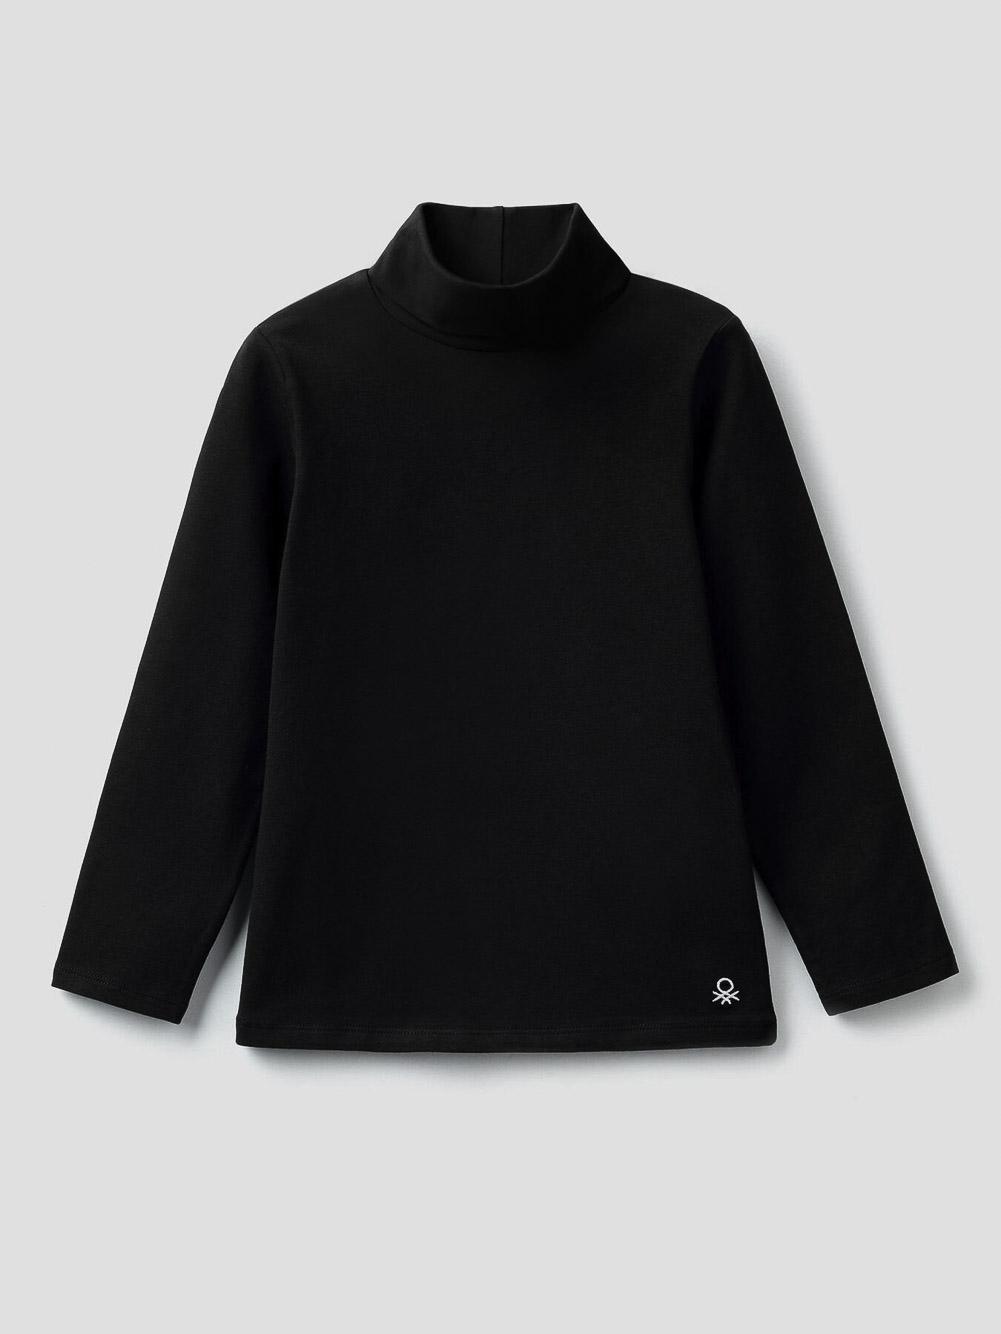 012 BENETTON T-shirt με γιακά ζιβάγκο 3P4ZC2193 20A100